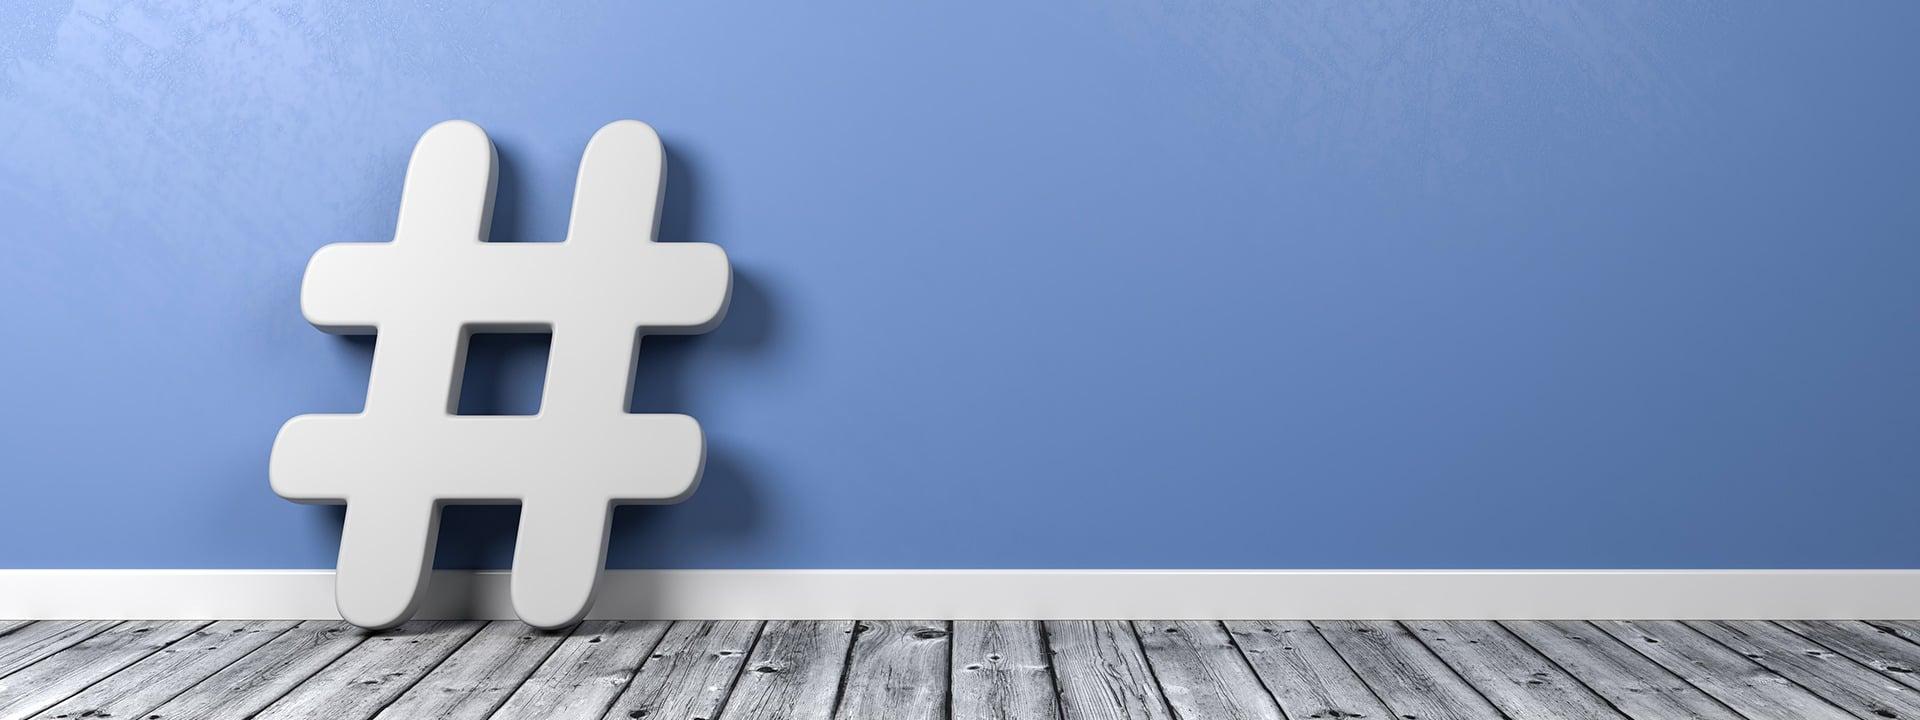 Social Media and social media marketing - a brief history